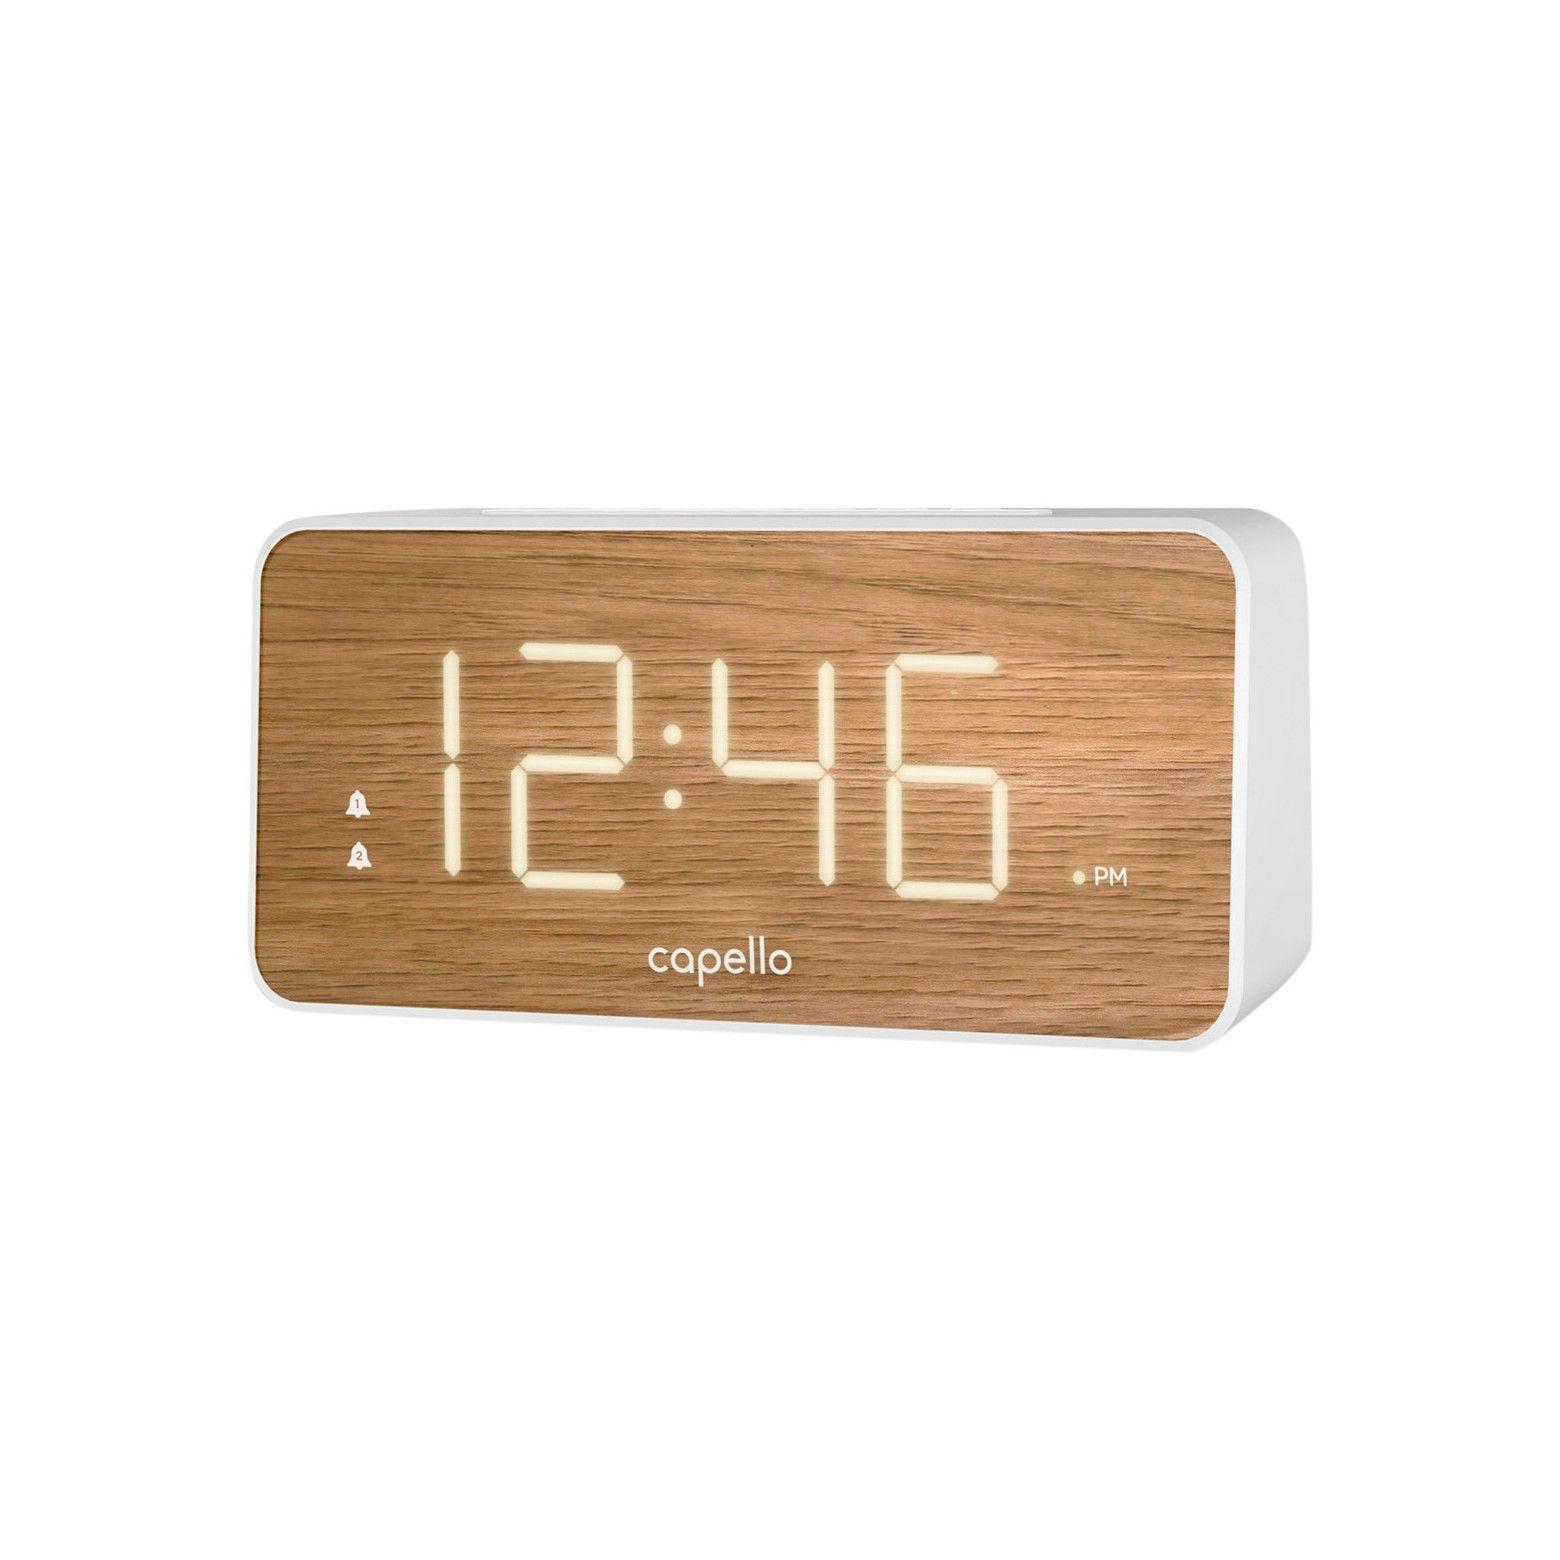 Extra Large Display Digital Alarm Clock White Pine Capello Modern Alarm Clock Digital Alarm Clock Alarm Clock